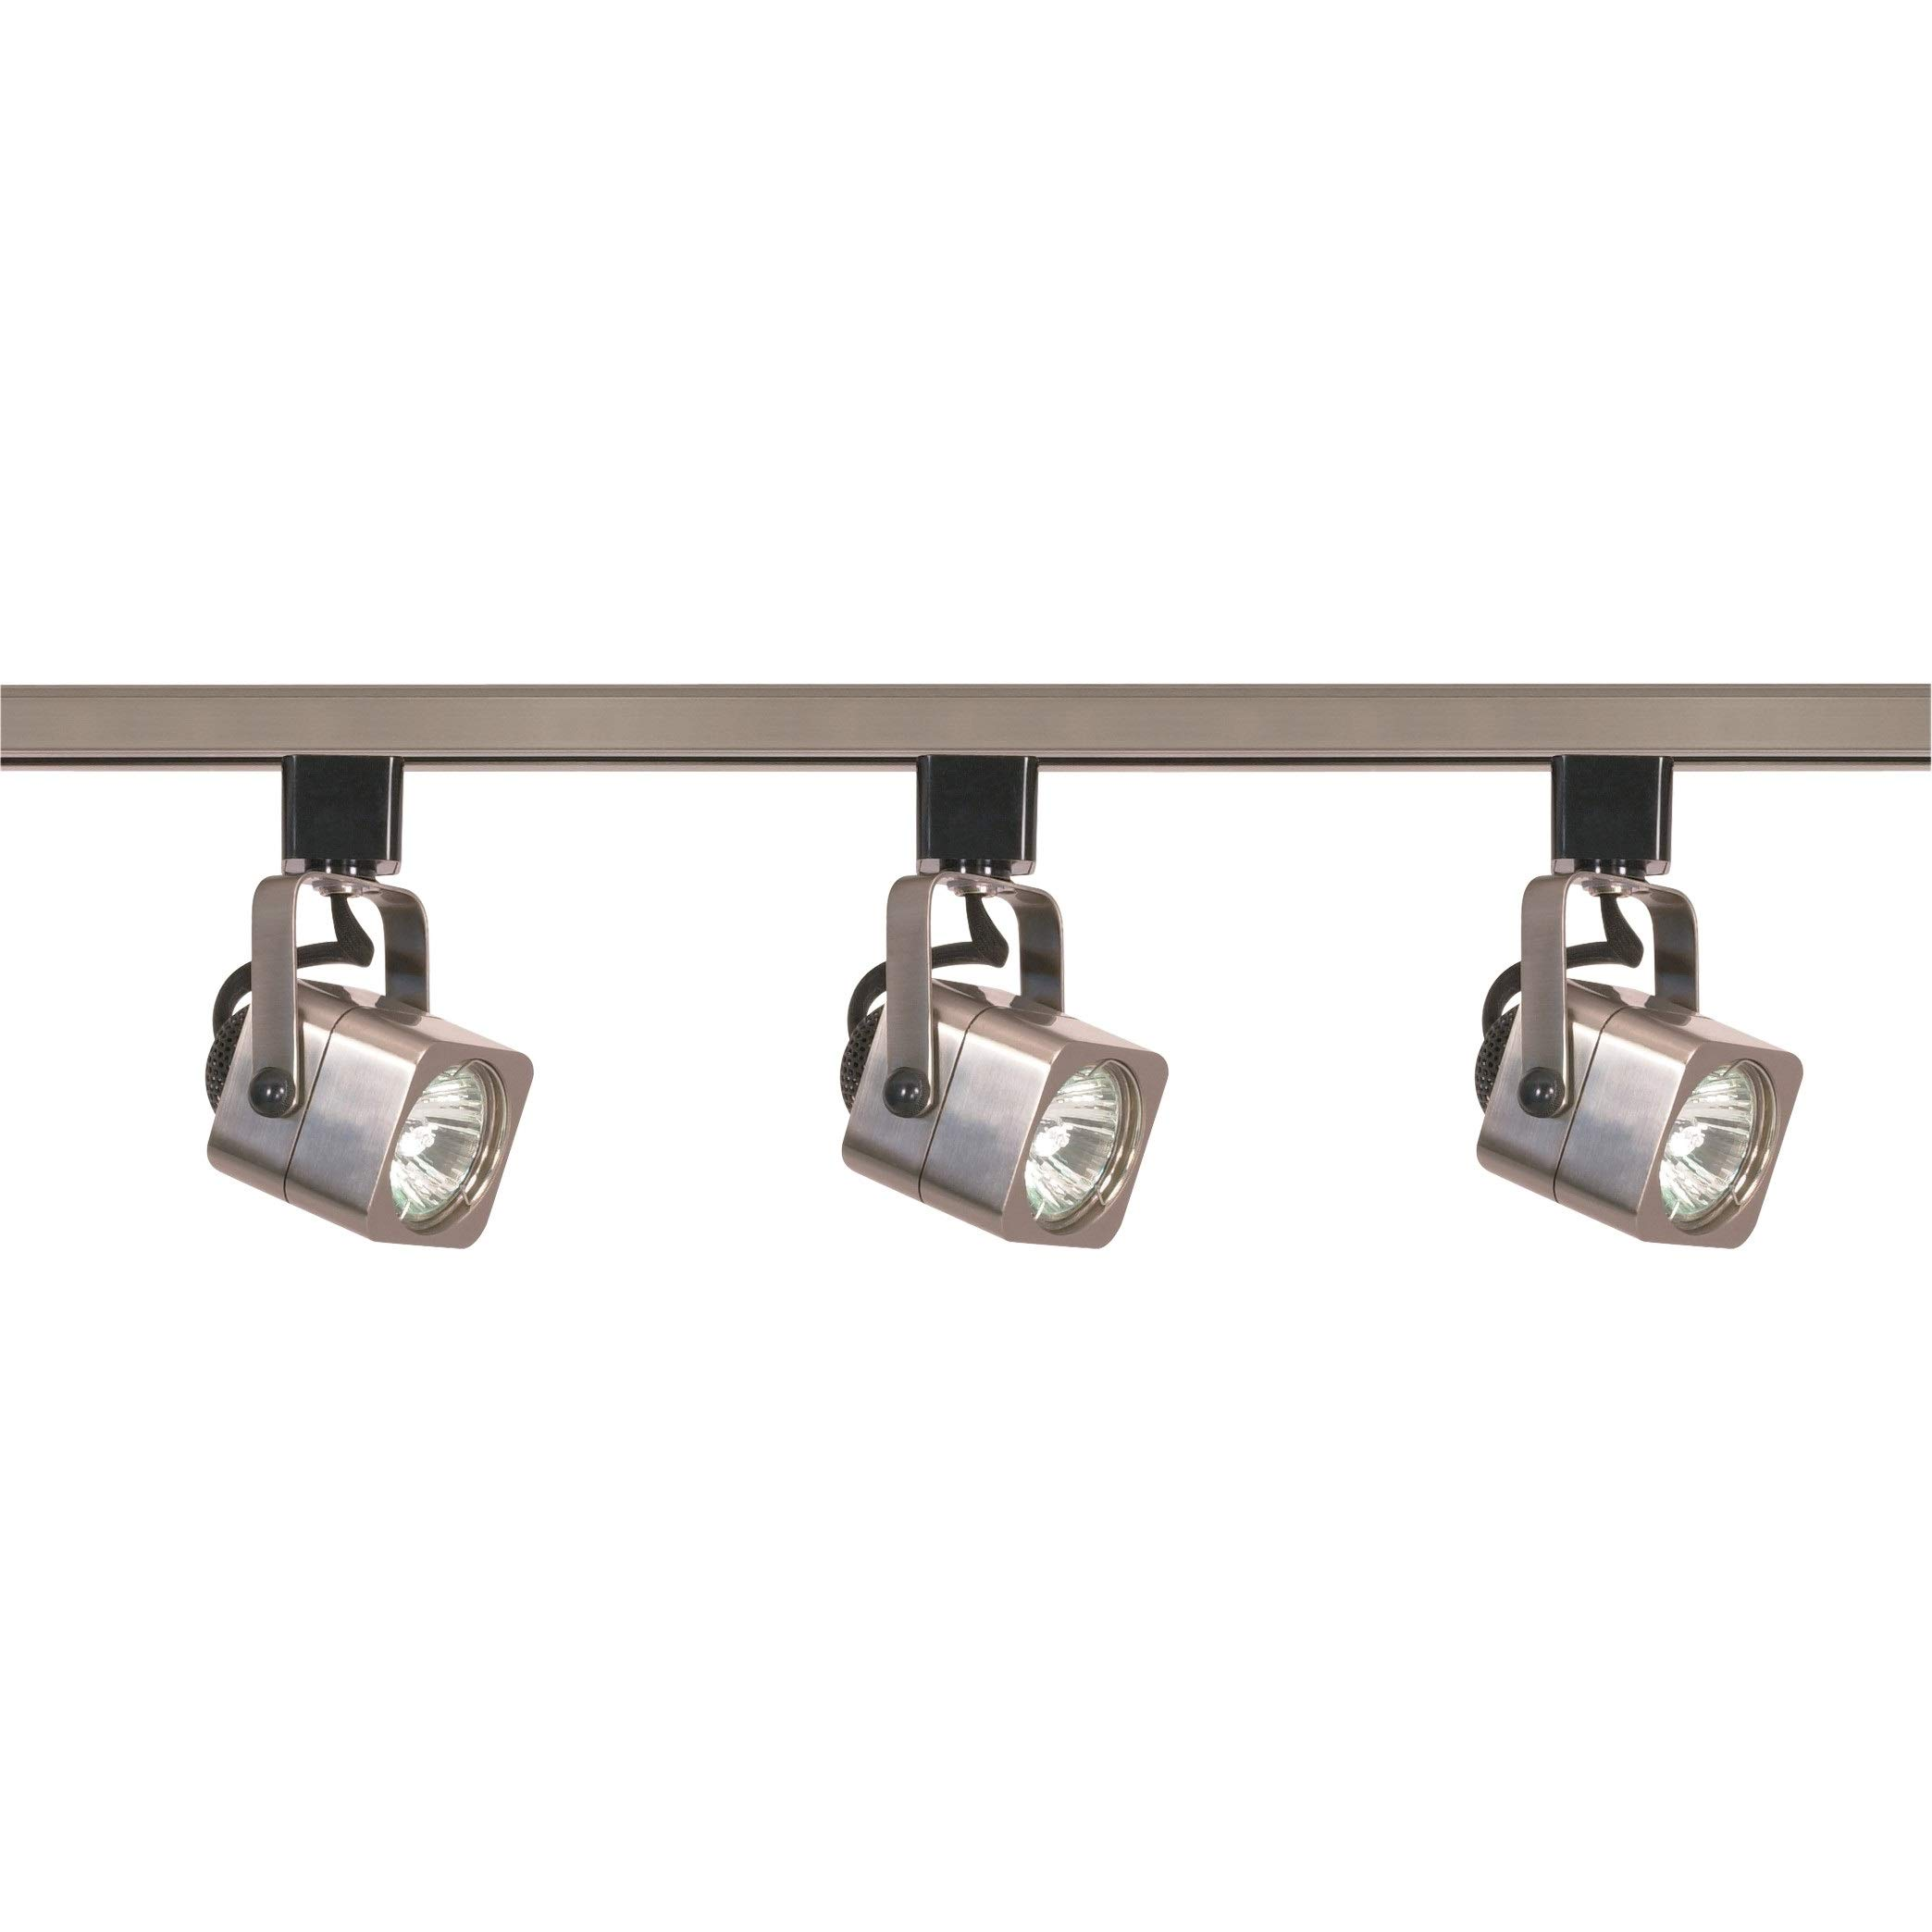 Ciata lighting 3 Light Square Track Lighting 48 Inches Long MR16 Bulb, GU10 Base 50 Watts (Brushed Nickel Finish)